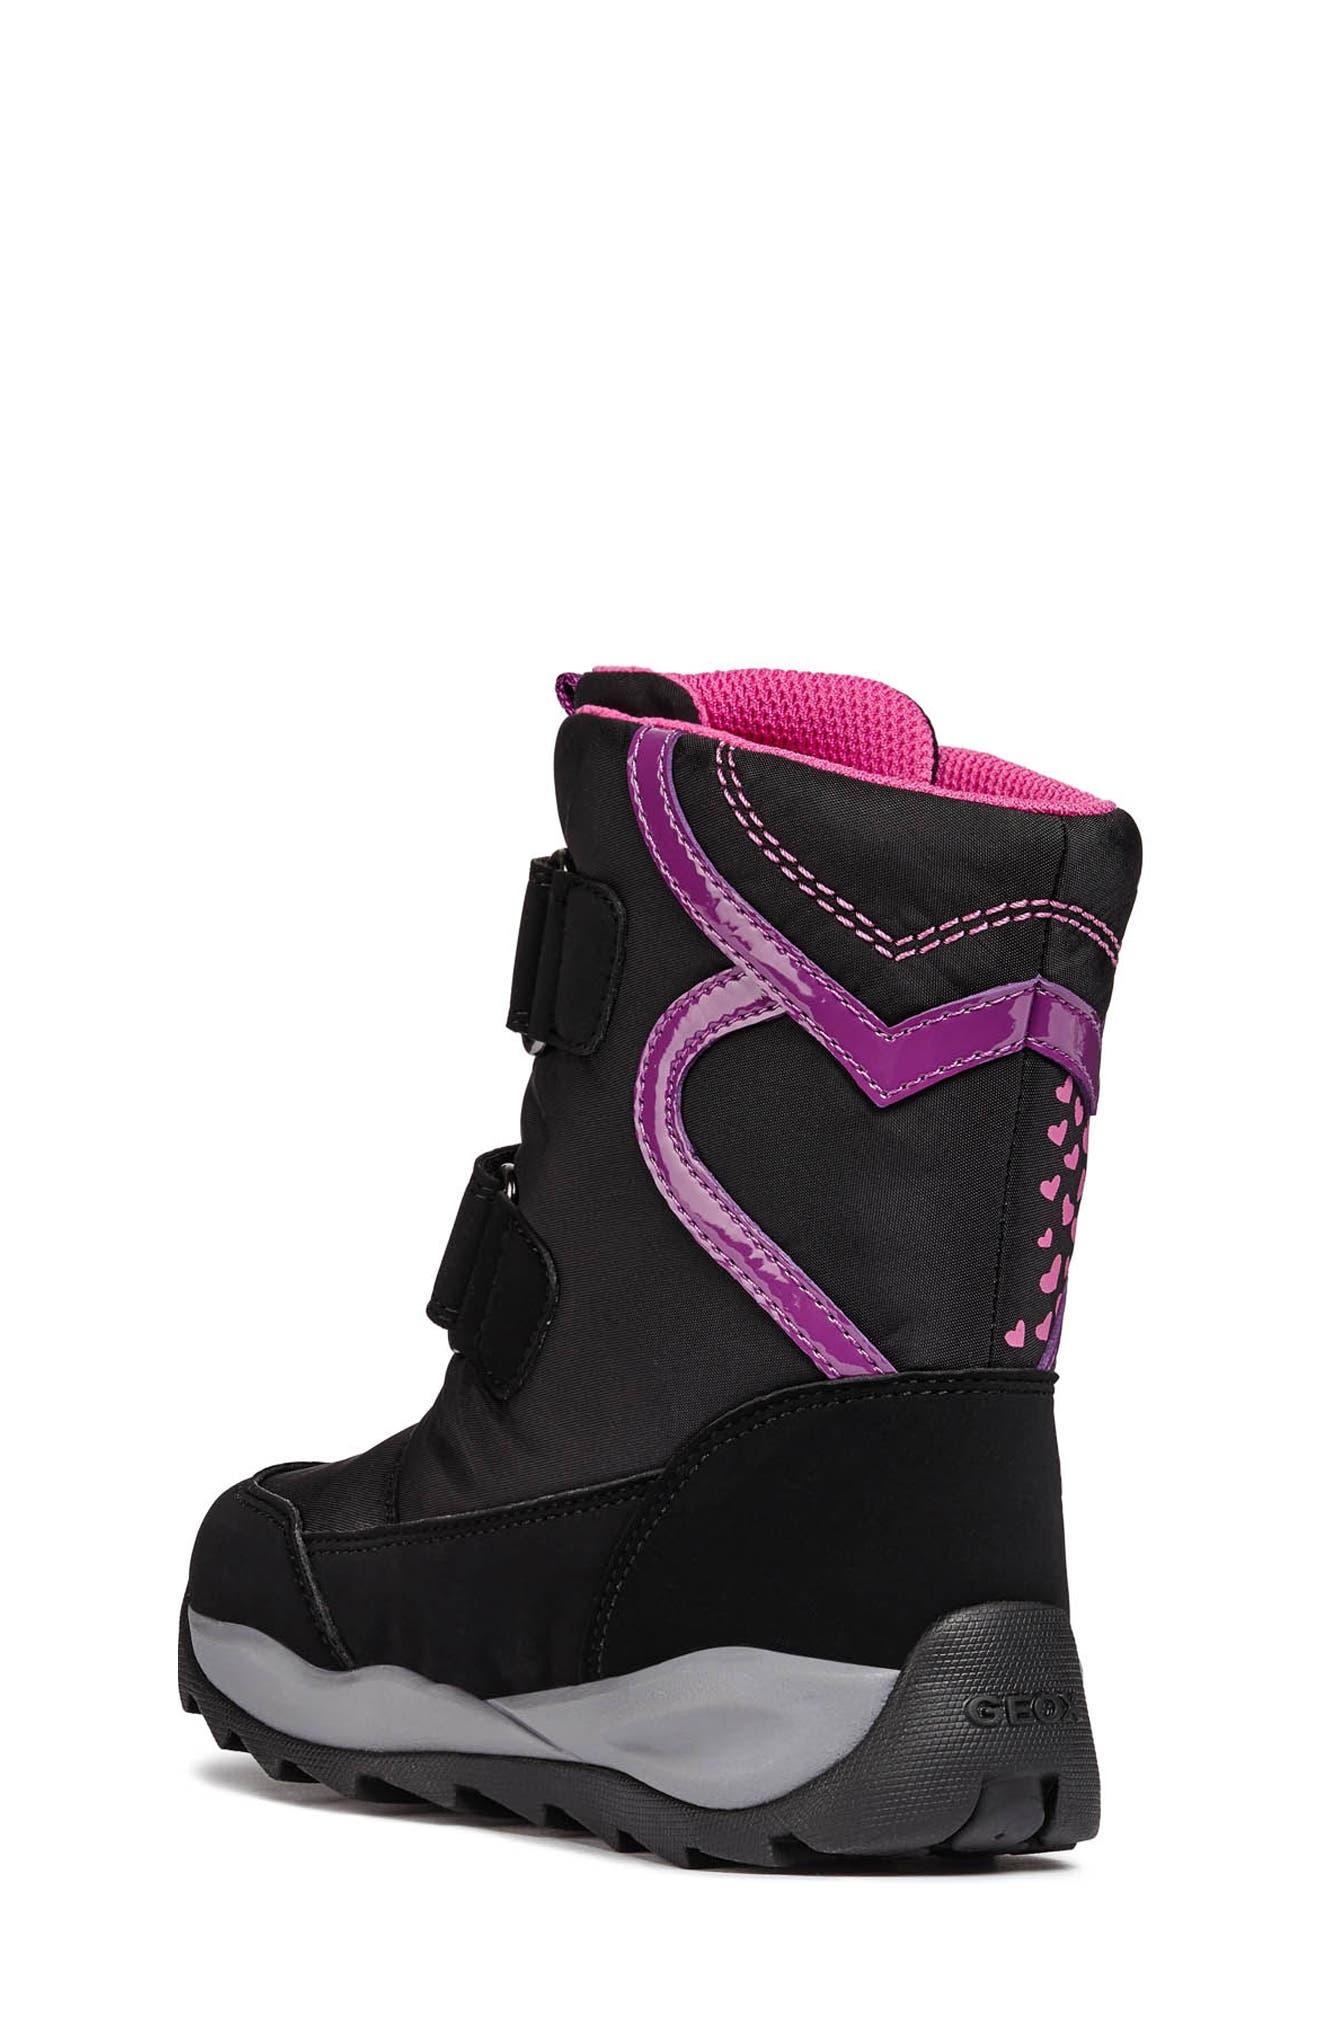 Orizont ABX Waterproof Boot,                             Alternate thumbnail 2, color,                             BLACK/FUCHSIA